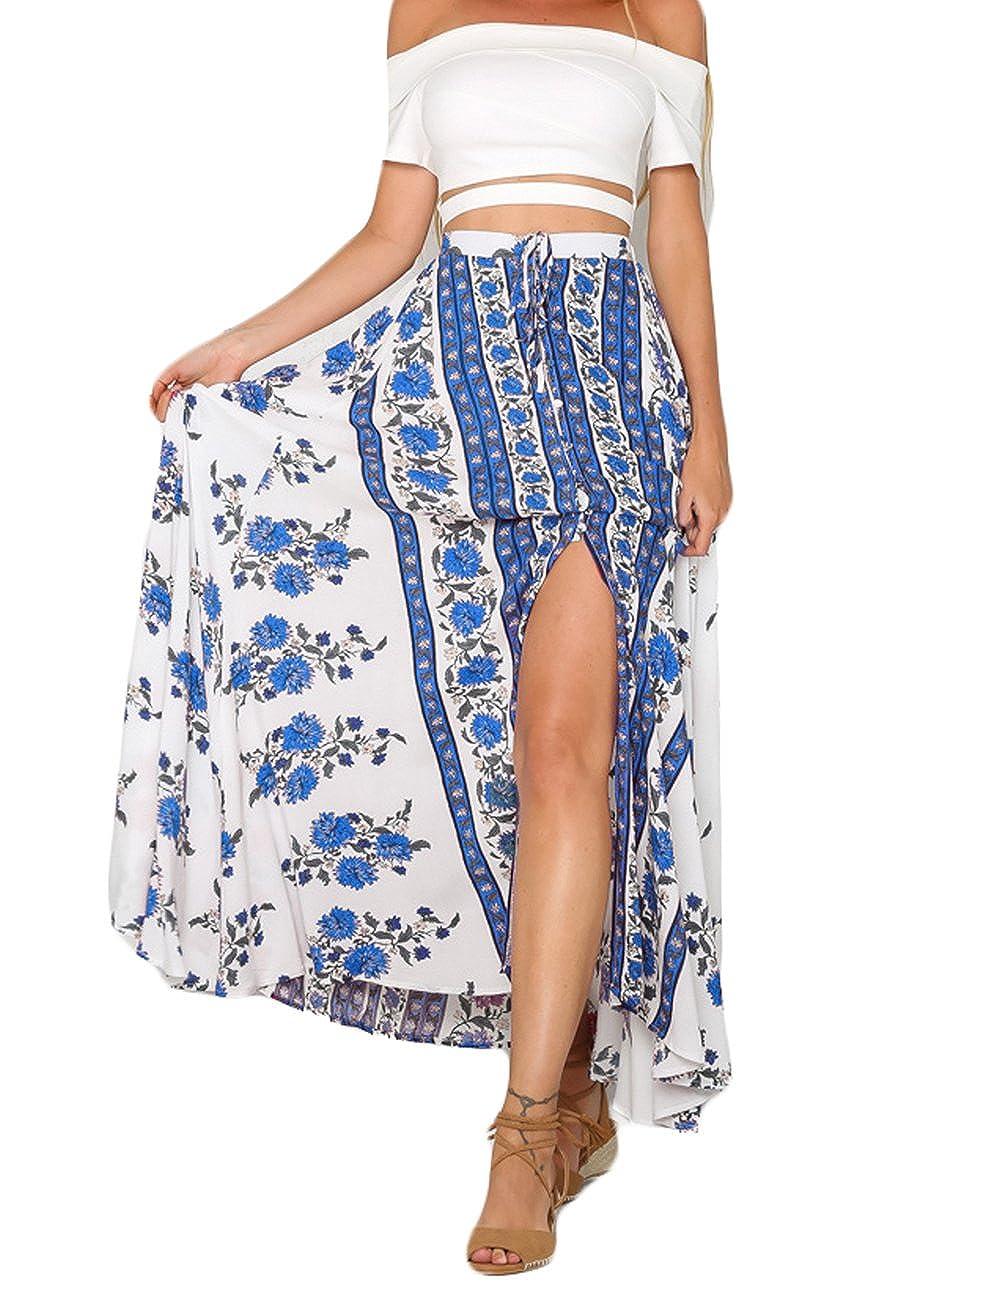 Whear Women Boho Floral Tie Up Waist Summer Asymmetrical Split Cover Up Beach Wrap Maxi Skirt